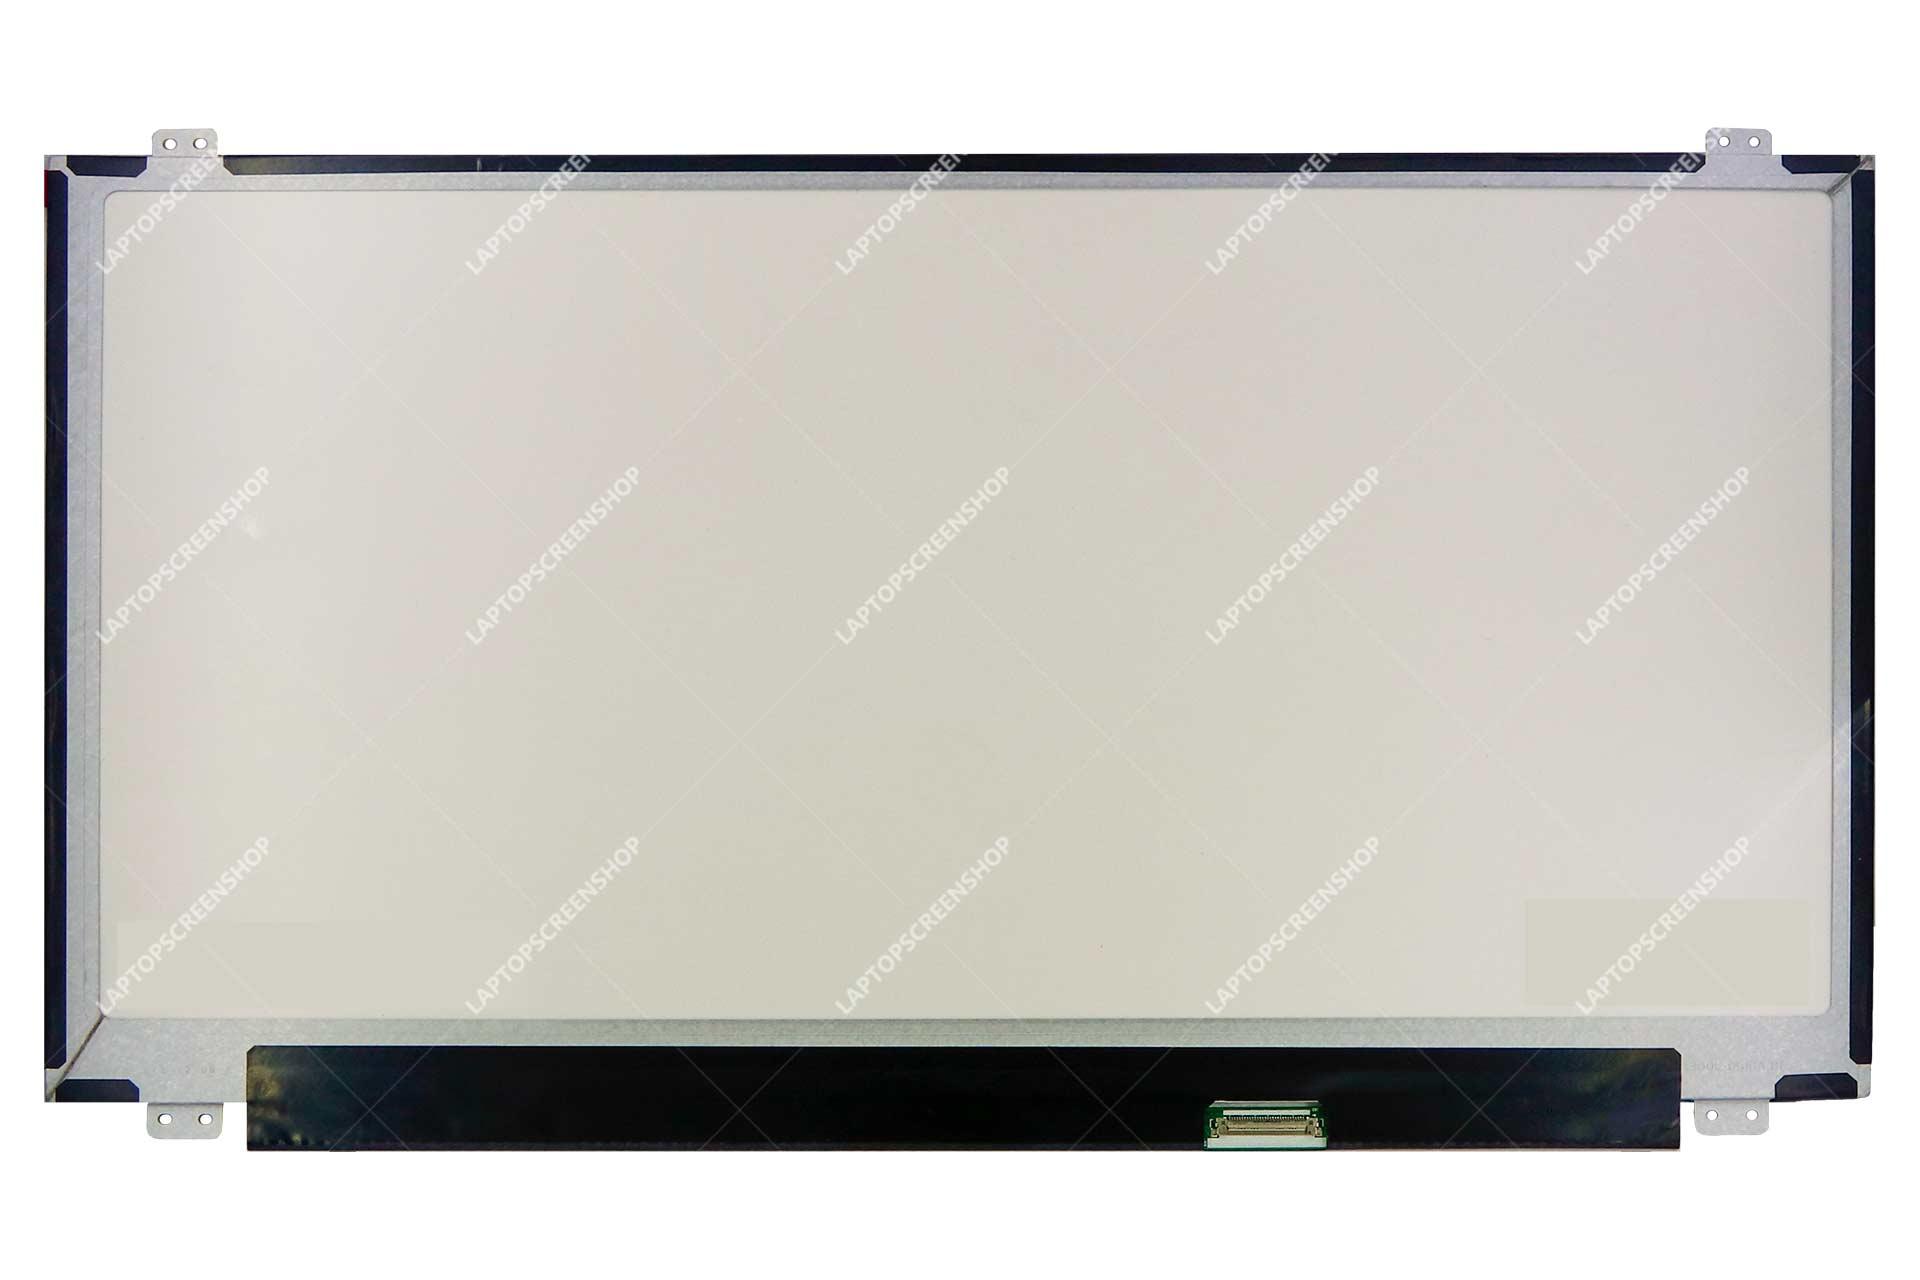 ACER-ASPIRE-E1-510-2611-LCD |HD|فروشگاه لپ تاپ اسکرين | تعمير لپ تاپ